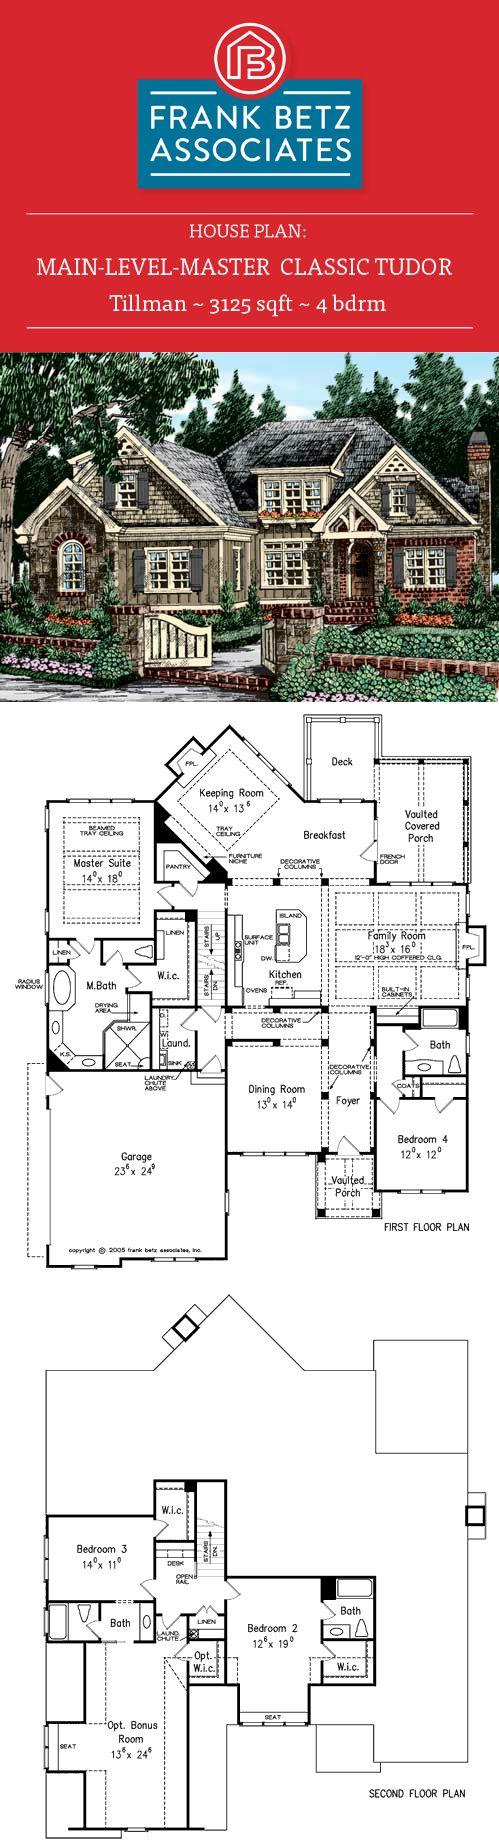 Betz house plans with large kitchen frank house plans designs ideas - Tillman 3125 Sqft 4 Bdrm English Classic Tudor House Plan Design By